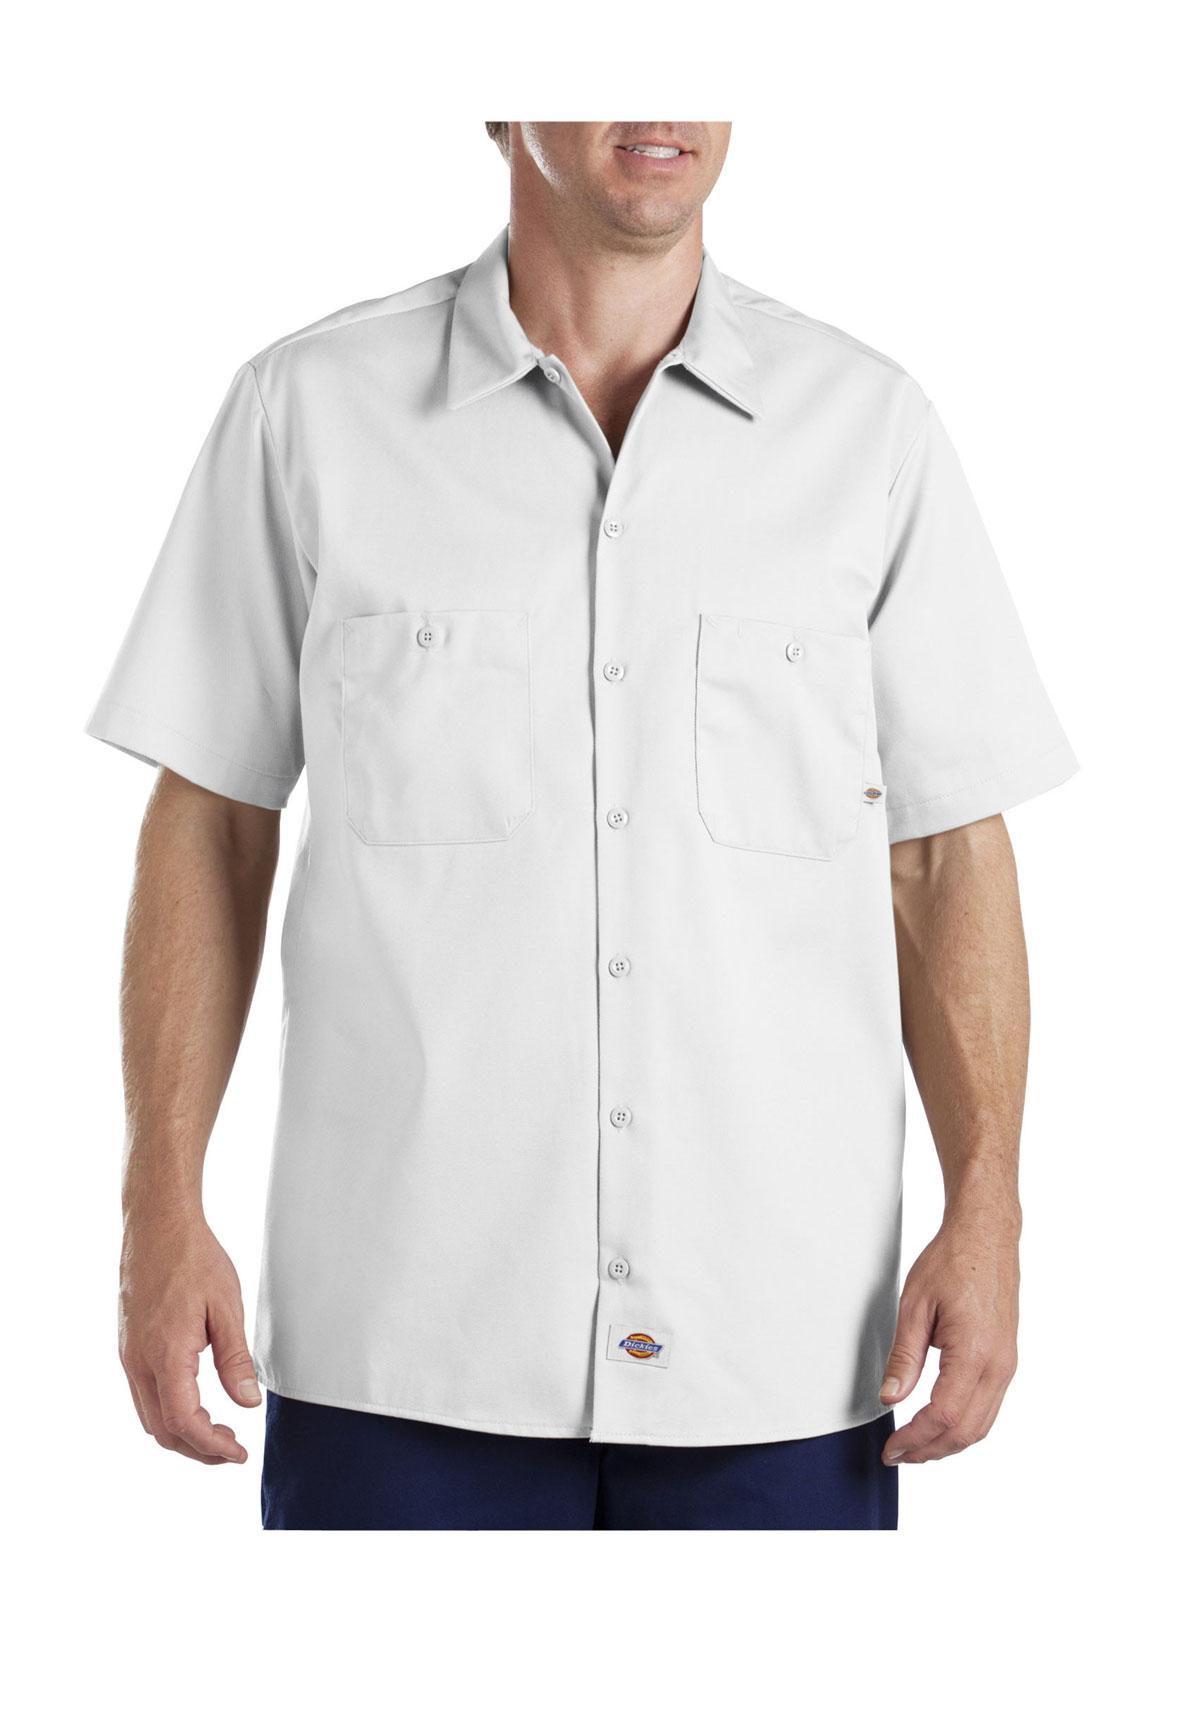 Dickies Ls307 Short Sleeve Industrial Cotton Work Shirt Ebay